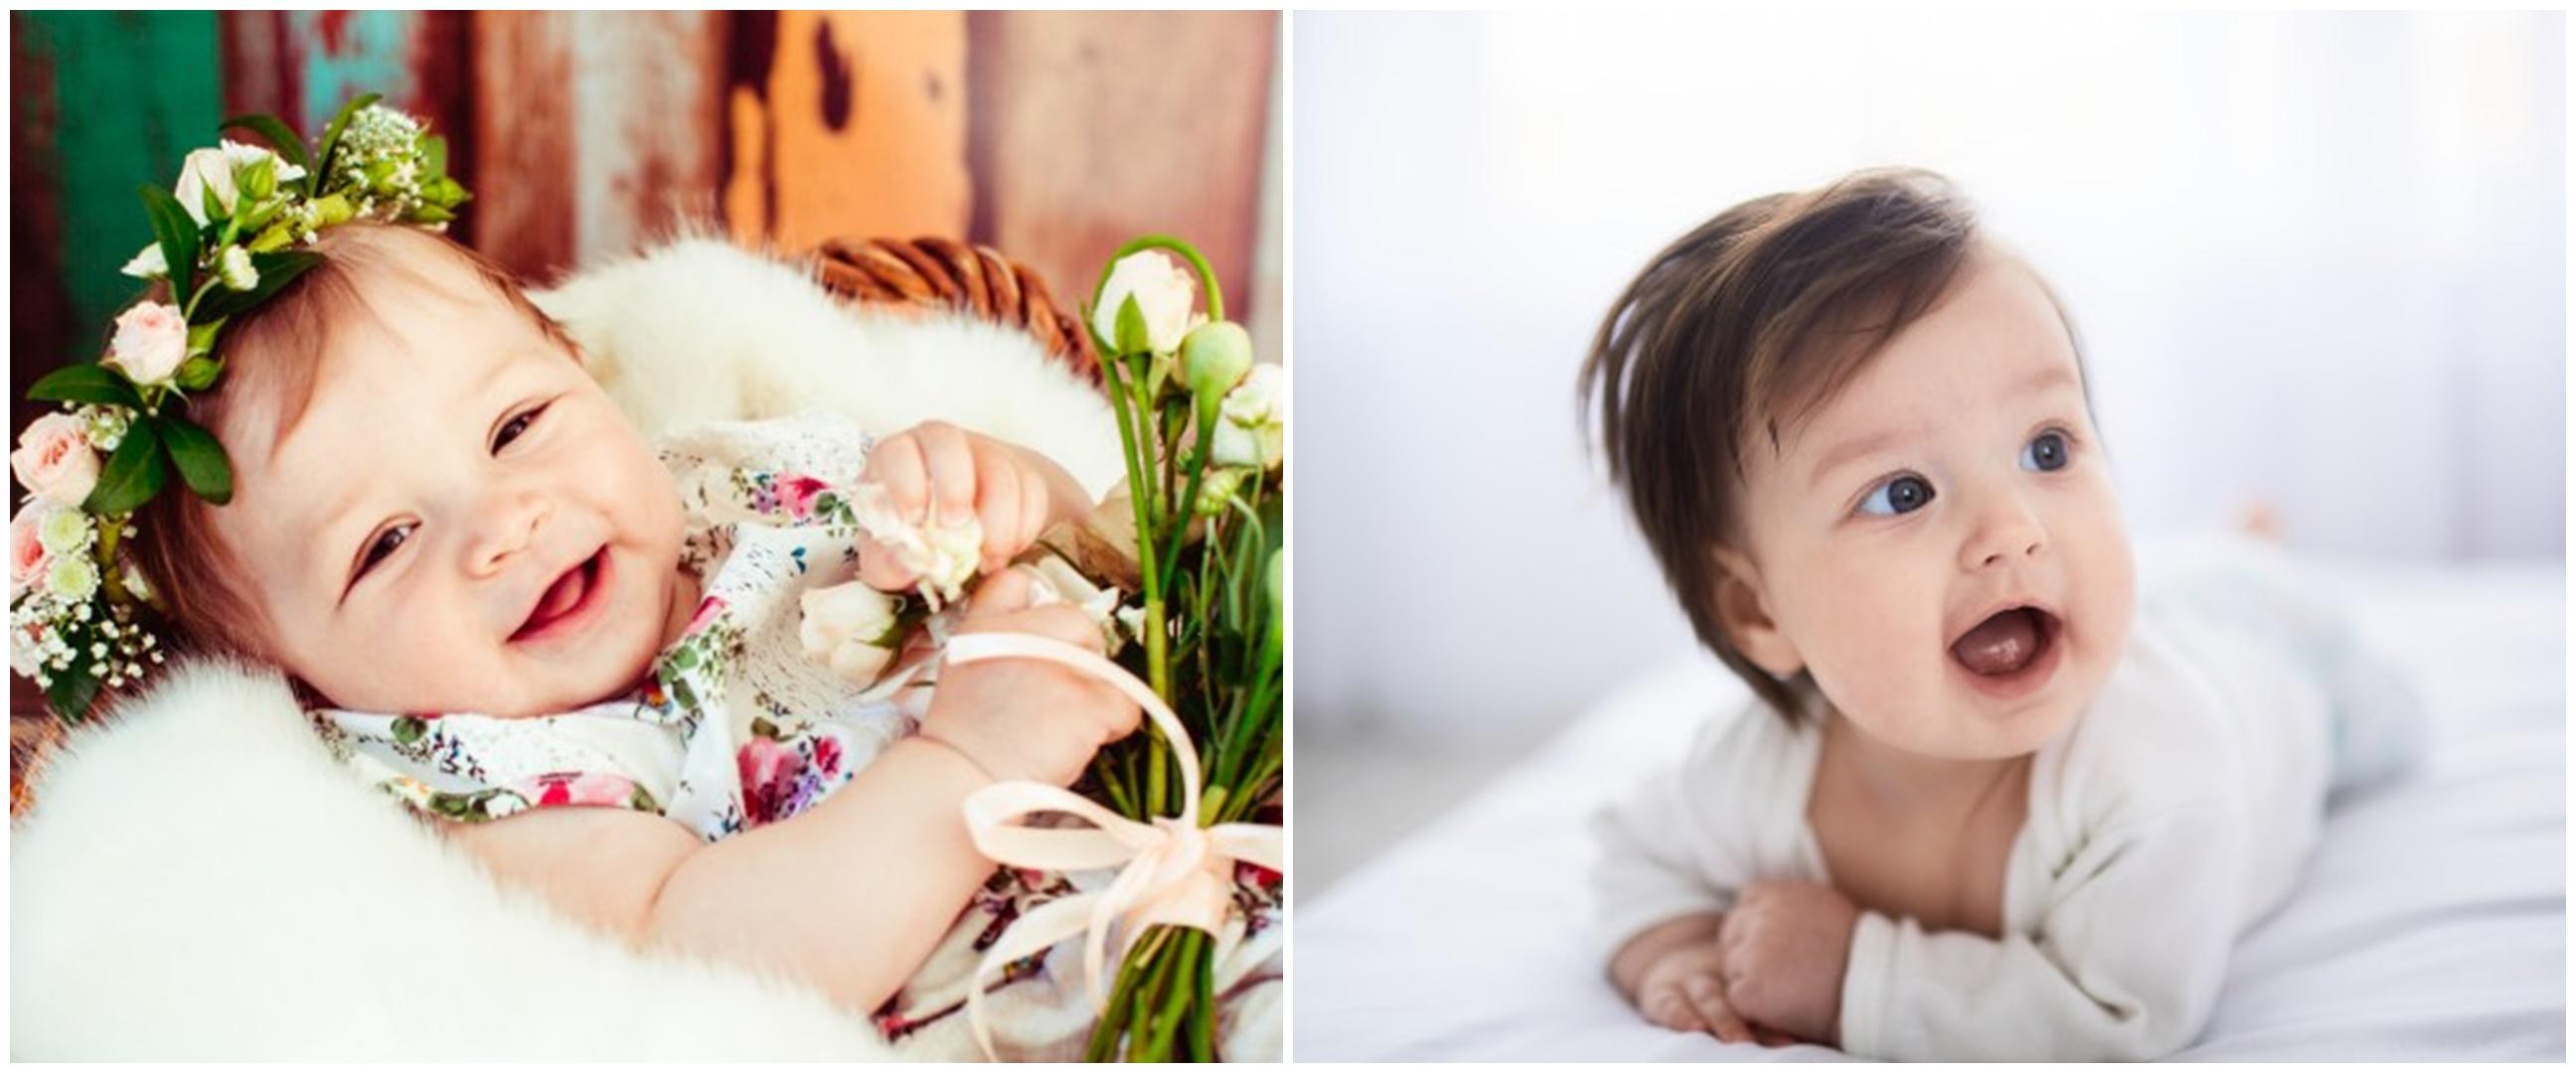 127 Nama bayi perempuan bahasa Arab dan artinya